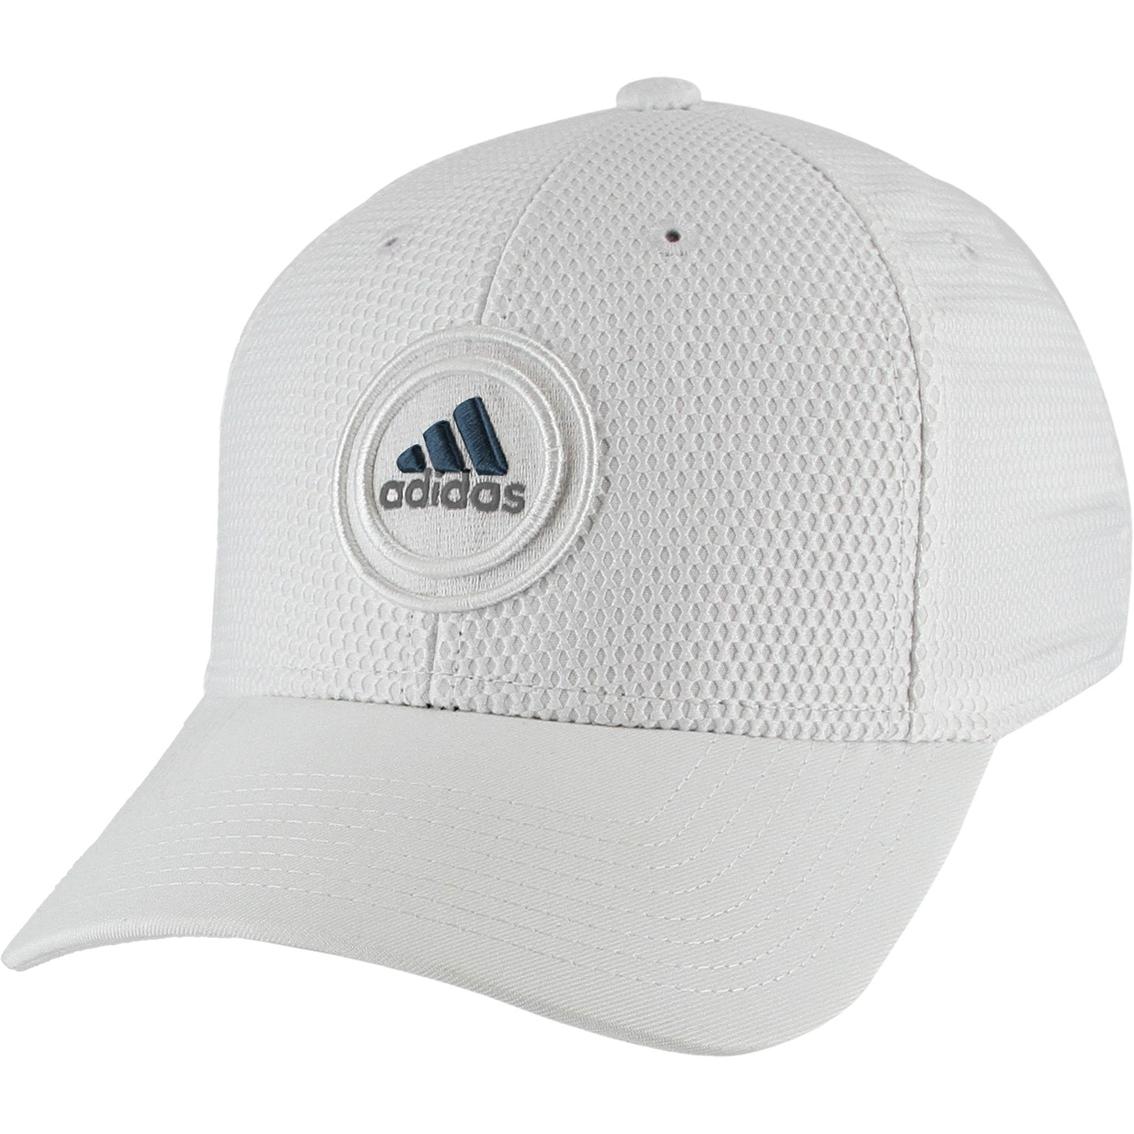 2c7b8161134e6 Adidas Men's Soldier Stretch Fit Cap | Hats | Apparel | Shop The ...